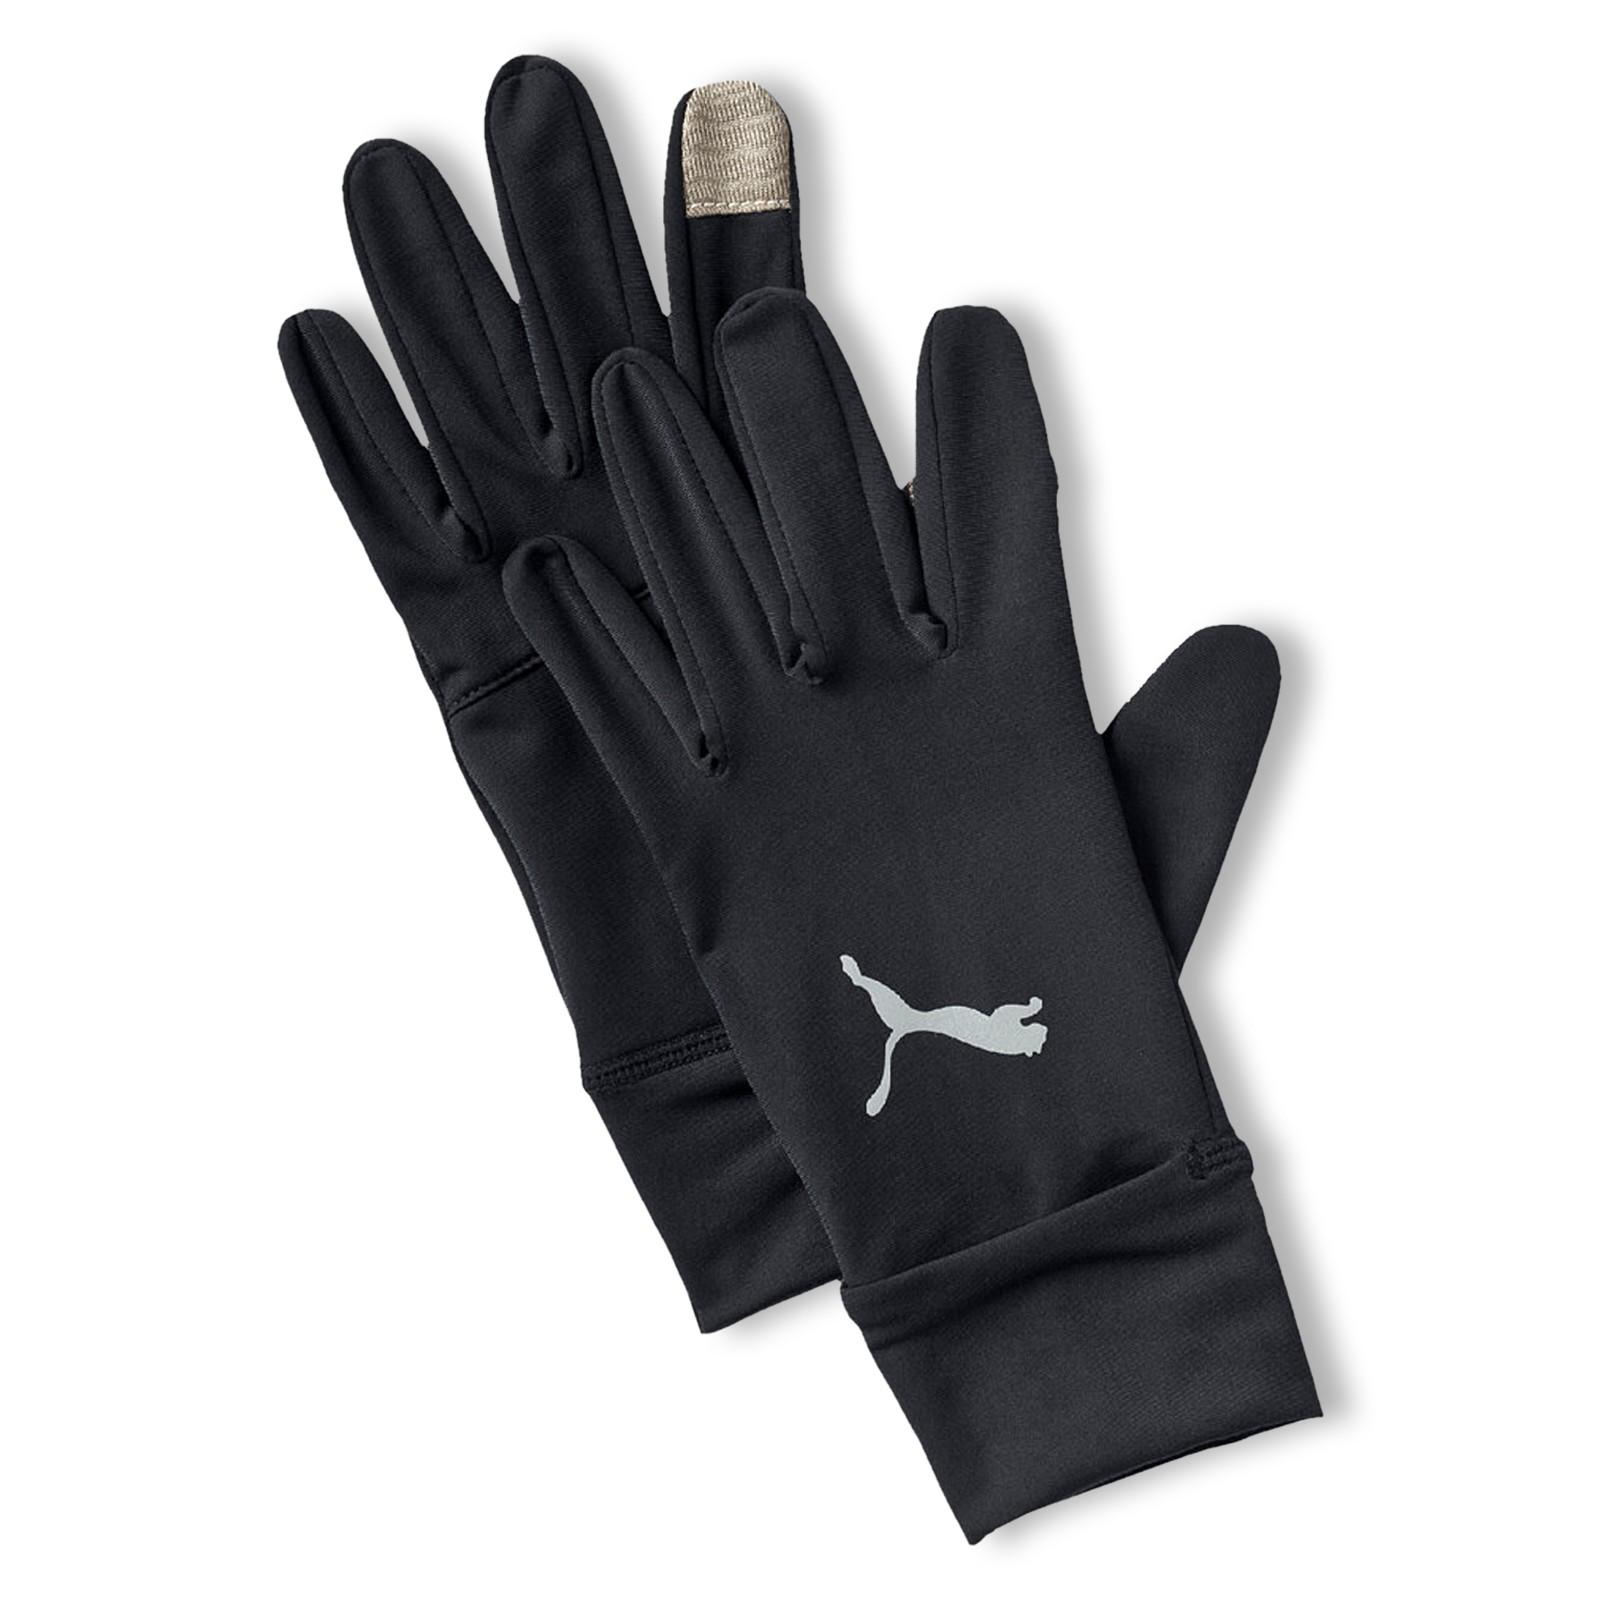 PUMA Running Unisex Performance Handschuhe Touchscreen Fingerhandschuhe S M L 041267 in schwarz